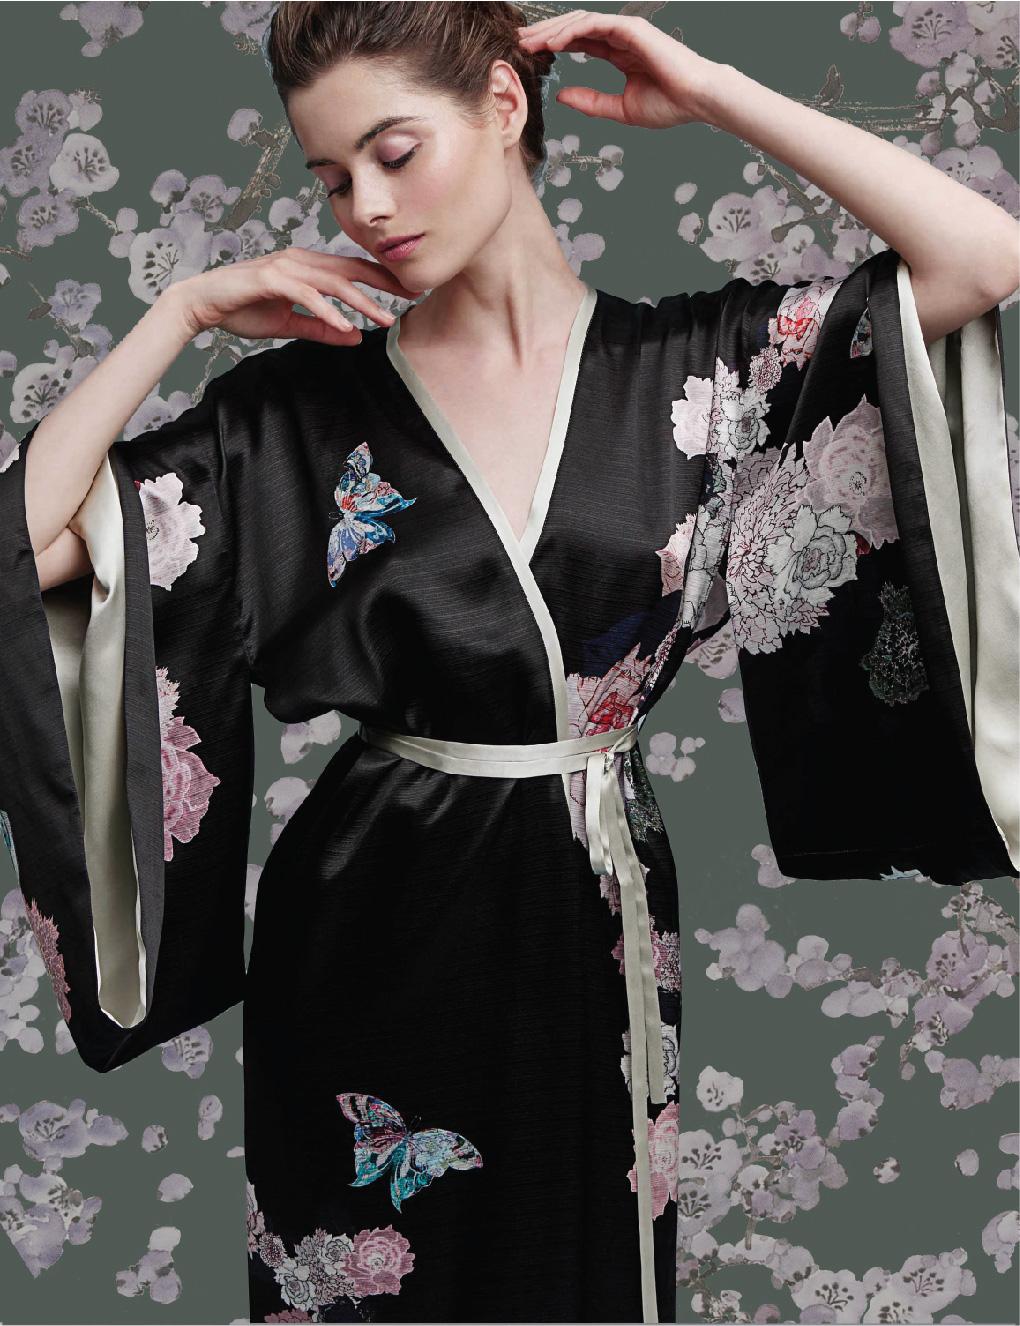 Meng-loungewear-luxury-womenswear-silk-prints-fashion-kimono-handdrawn-bloom-blossom-floral-butterfly-black-pink12.jpg